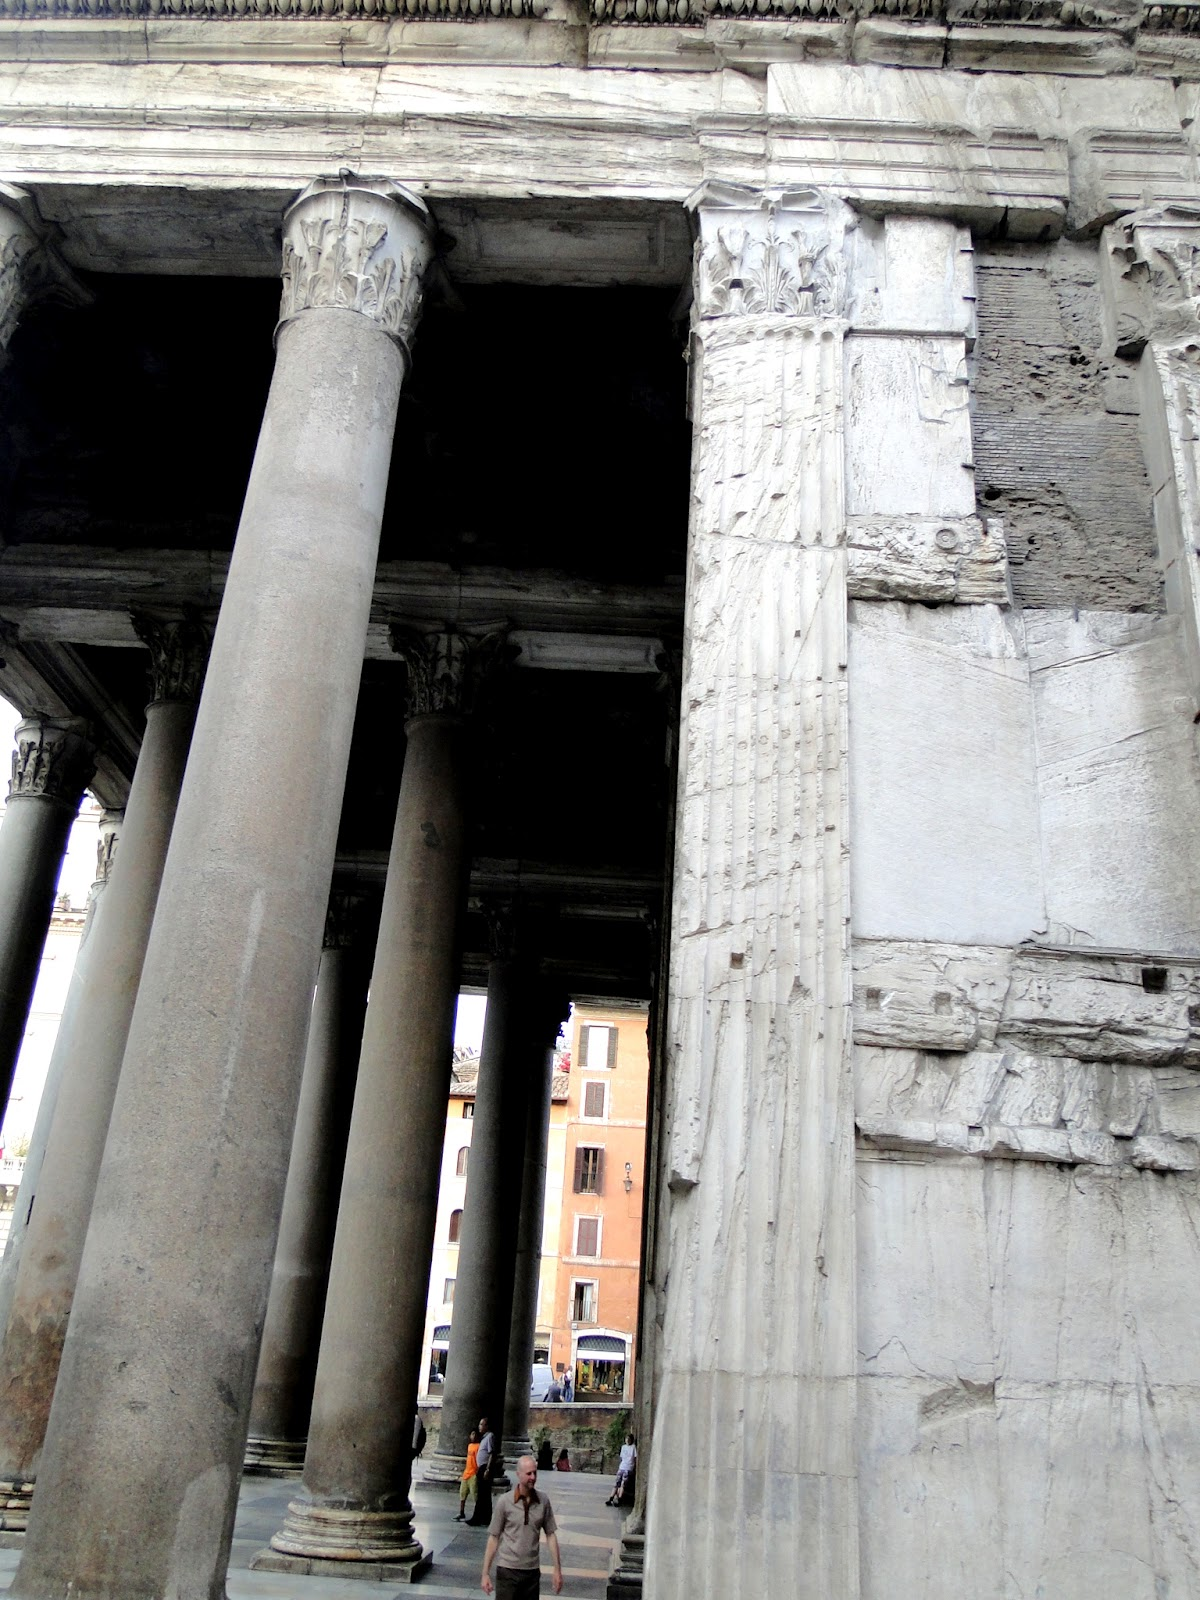 Italy Day 7: Pantheon